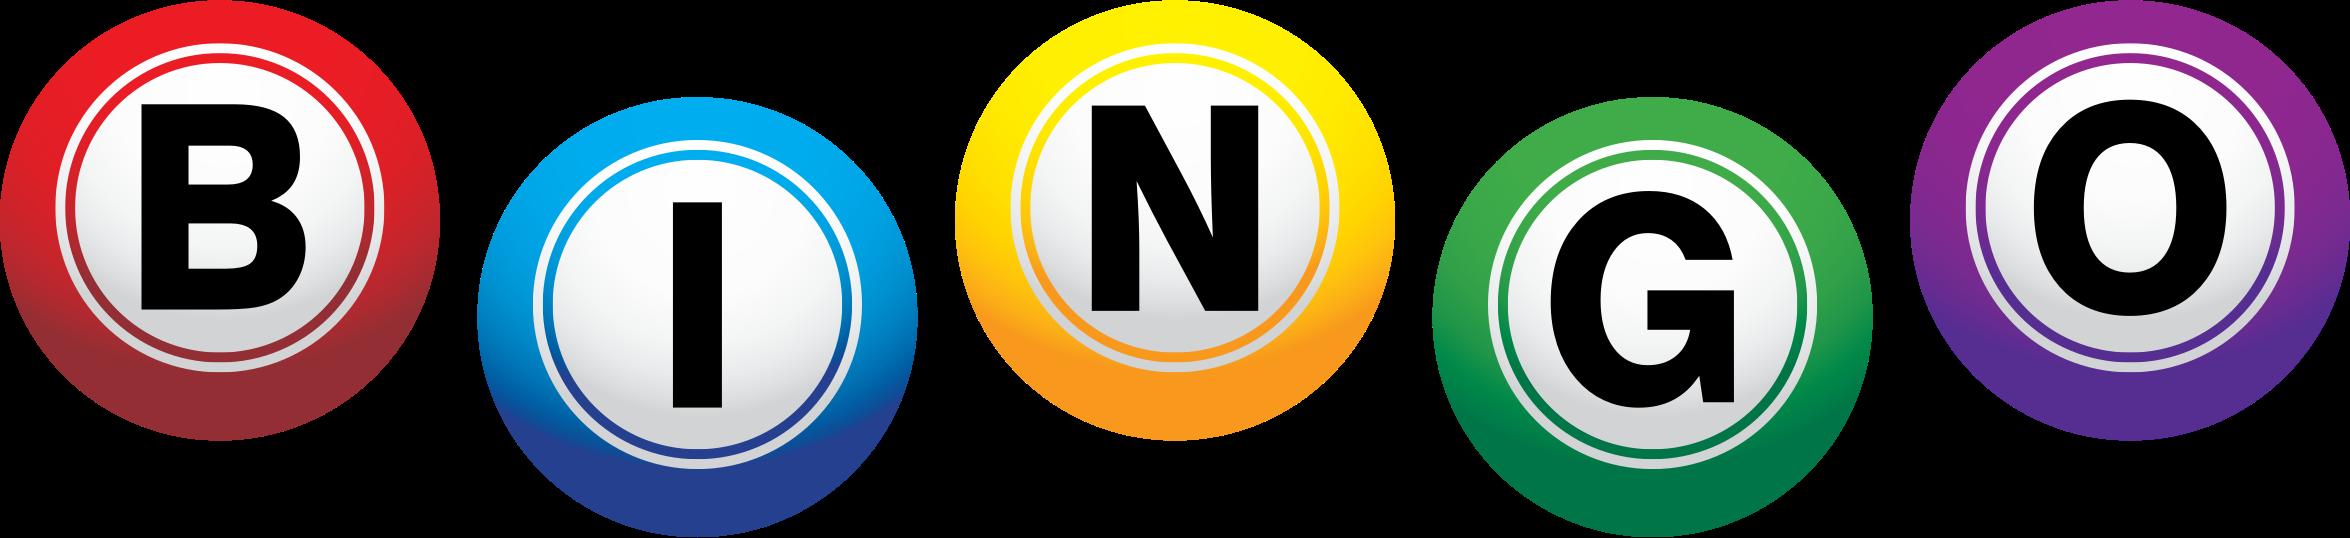 bingo players logo png - photo #44